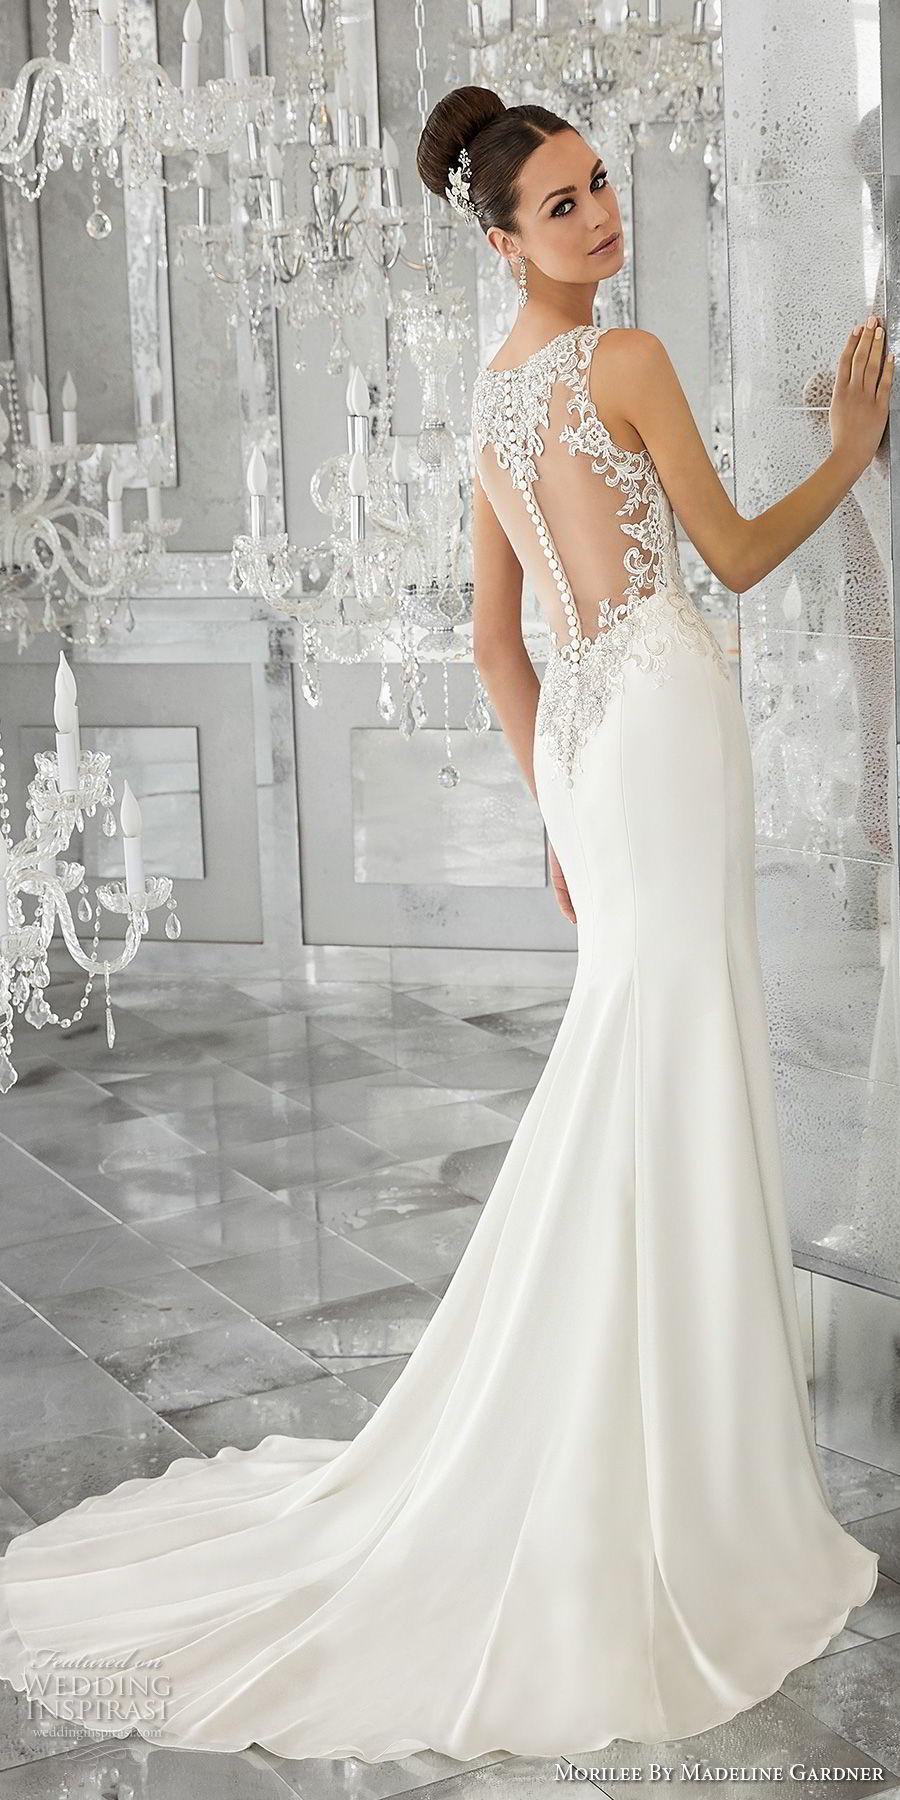 morilee fall 2017 blu bridal sleeveless strap v neck heavily embellished bodice elegant sheath wedding dress button lace back short train (64) bv